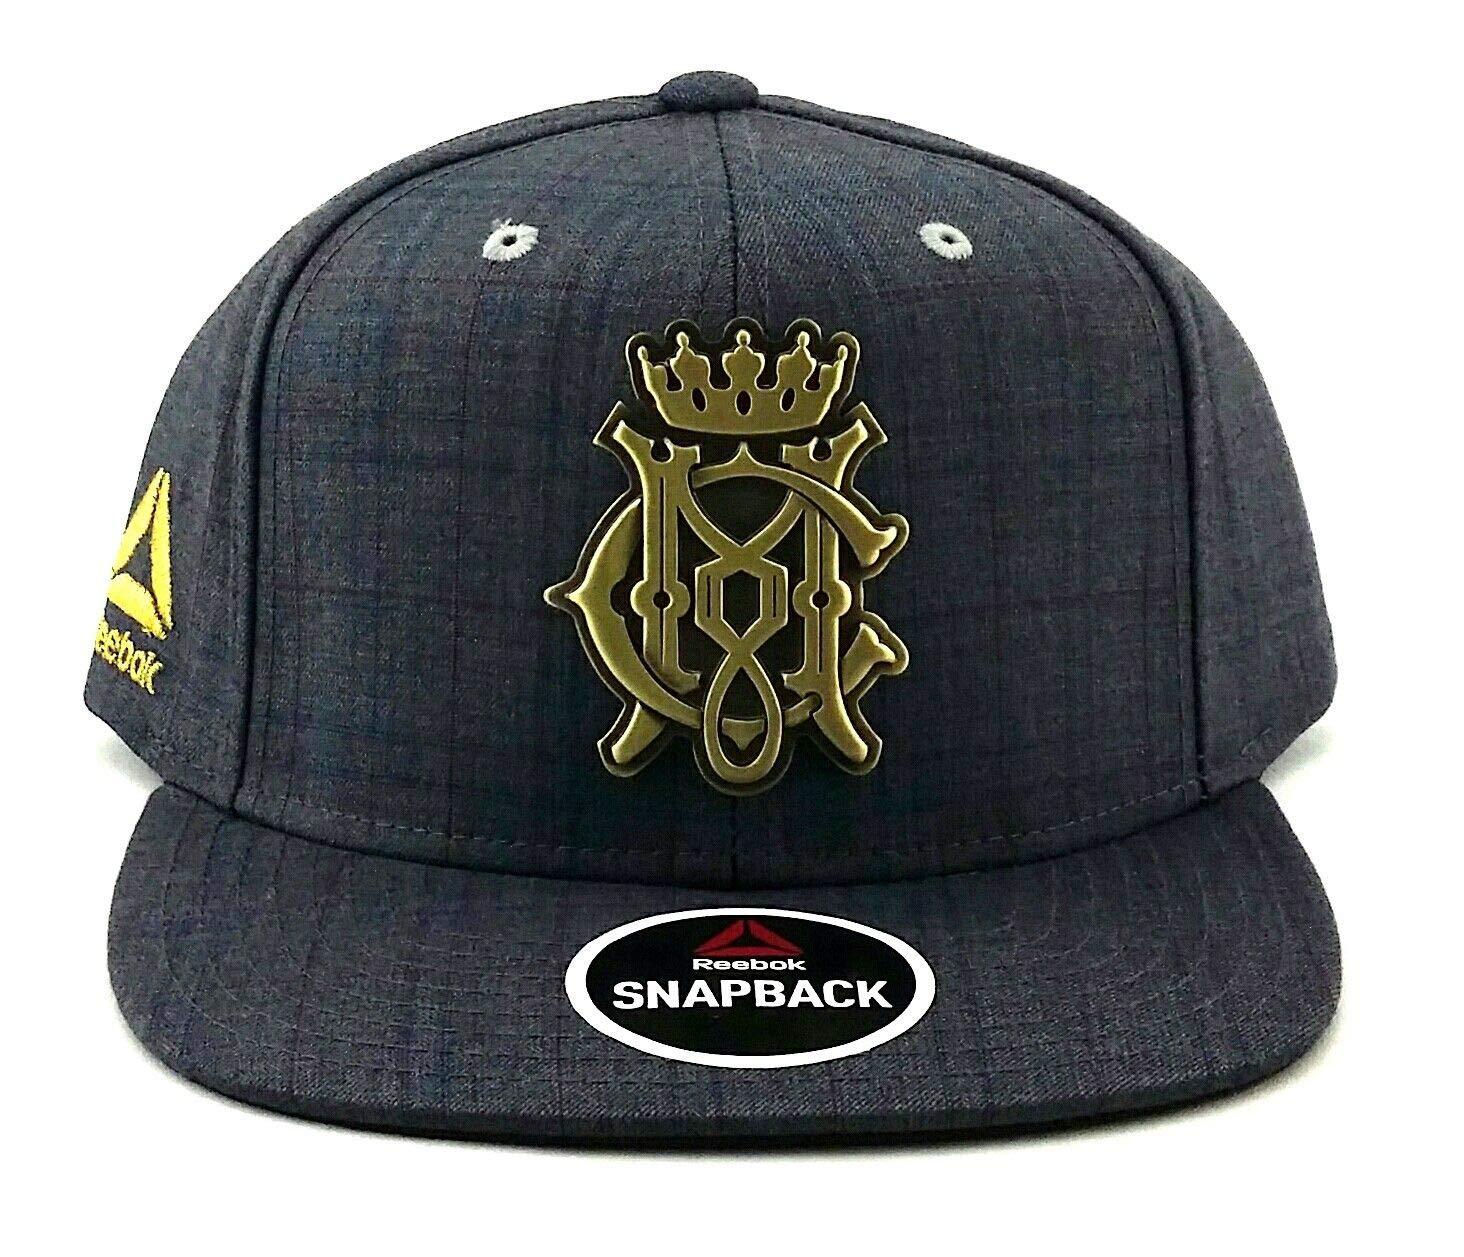 450f32626cdcd6 Amazon.com : Reebok Conor McGregor Plaid Snapback Hat : Sports & Outdoors